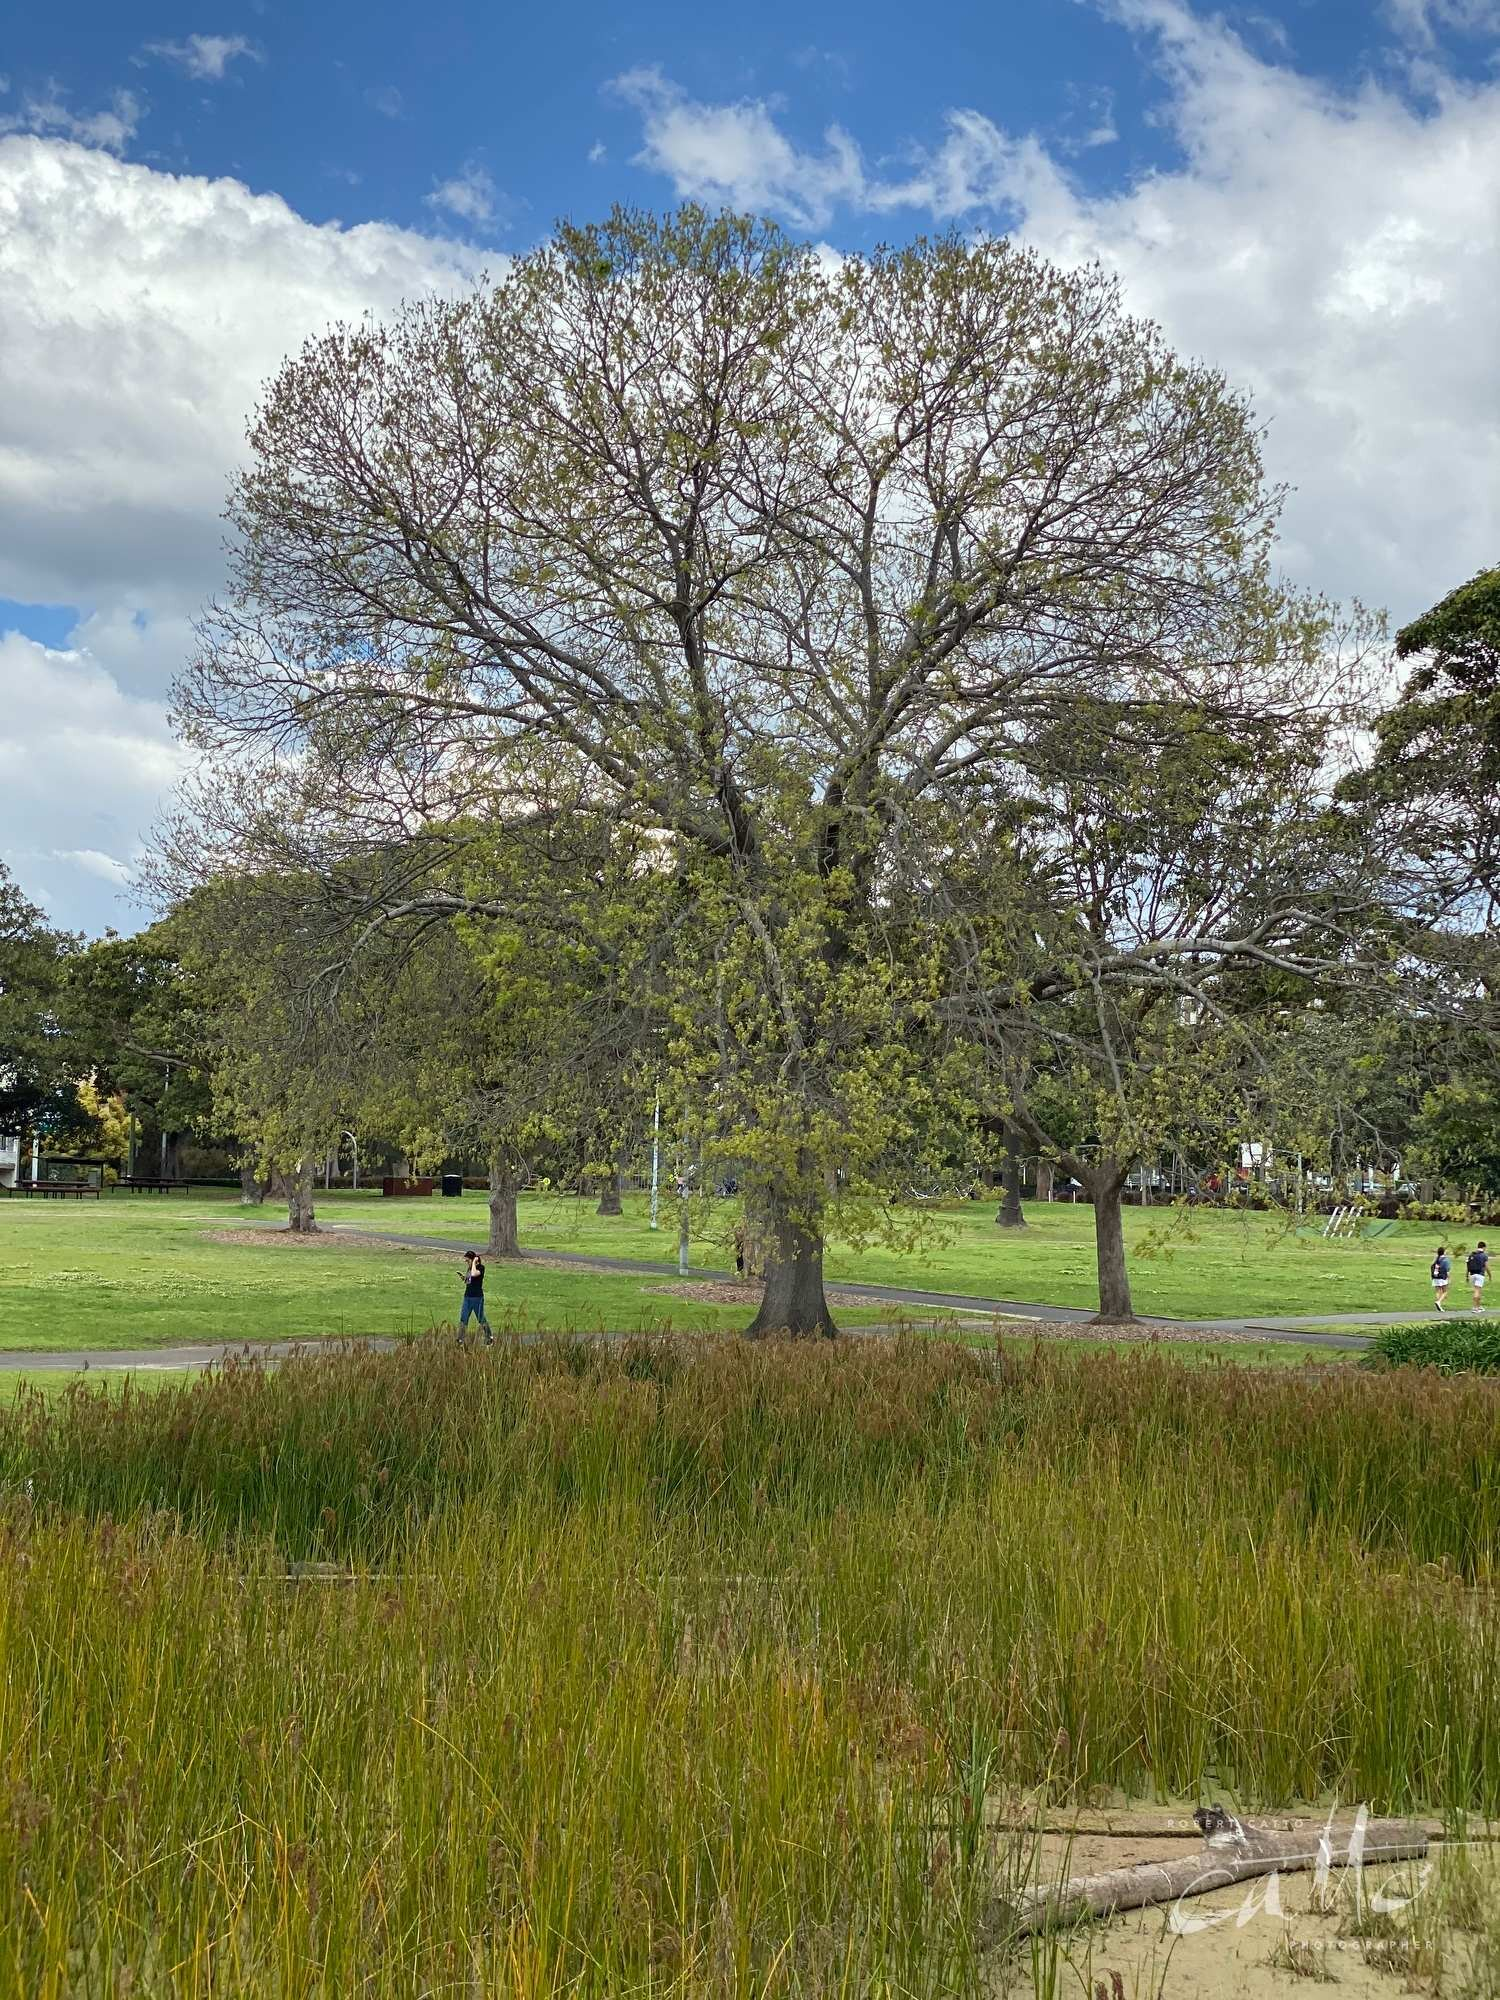 Victoria Park, Sydney (Iphone 11 Pro - 2x zoom lens)